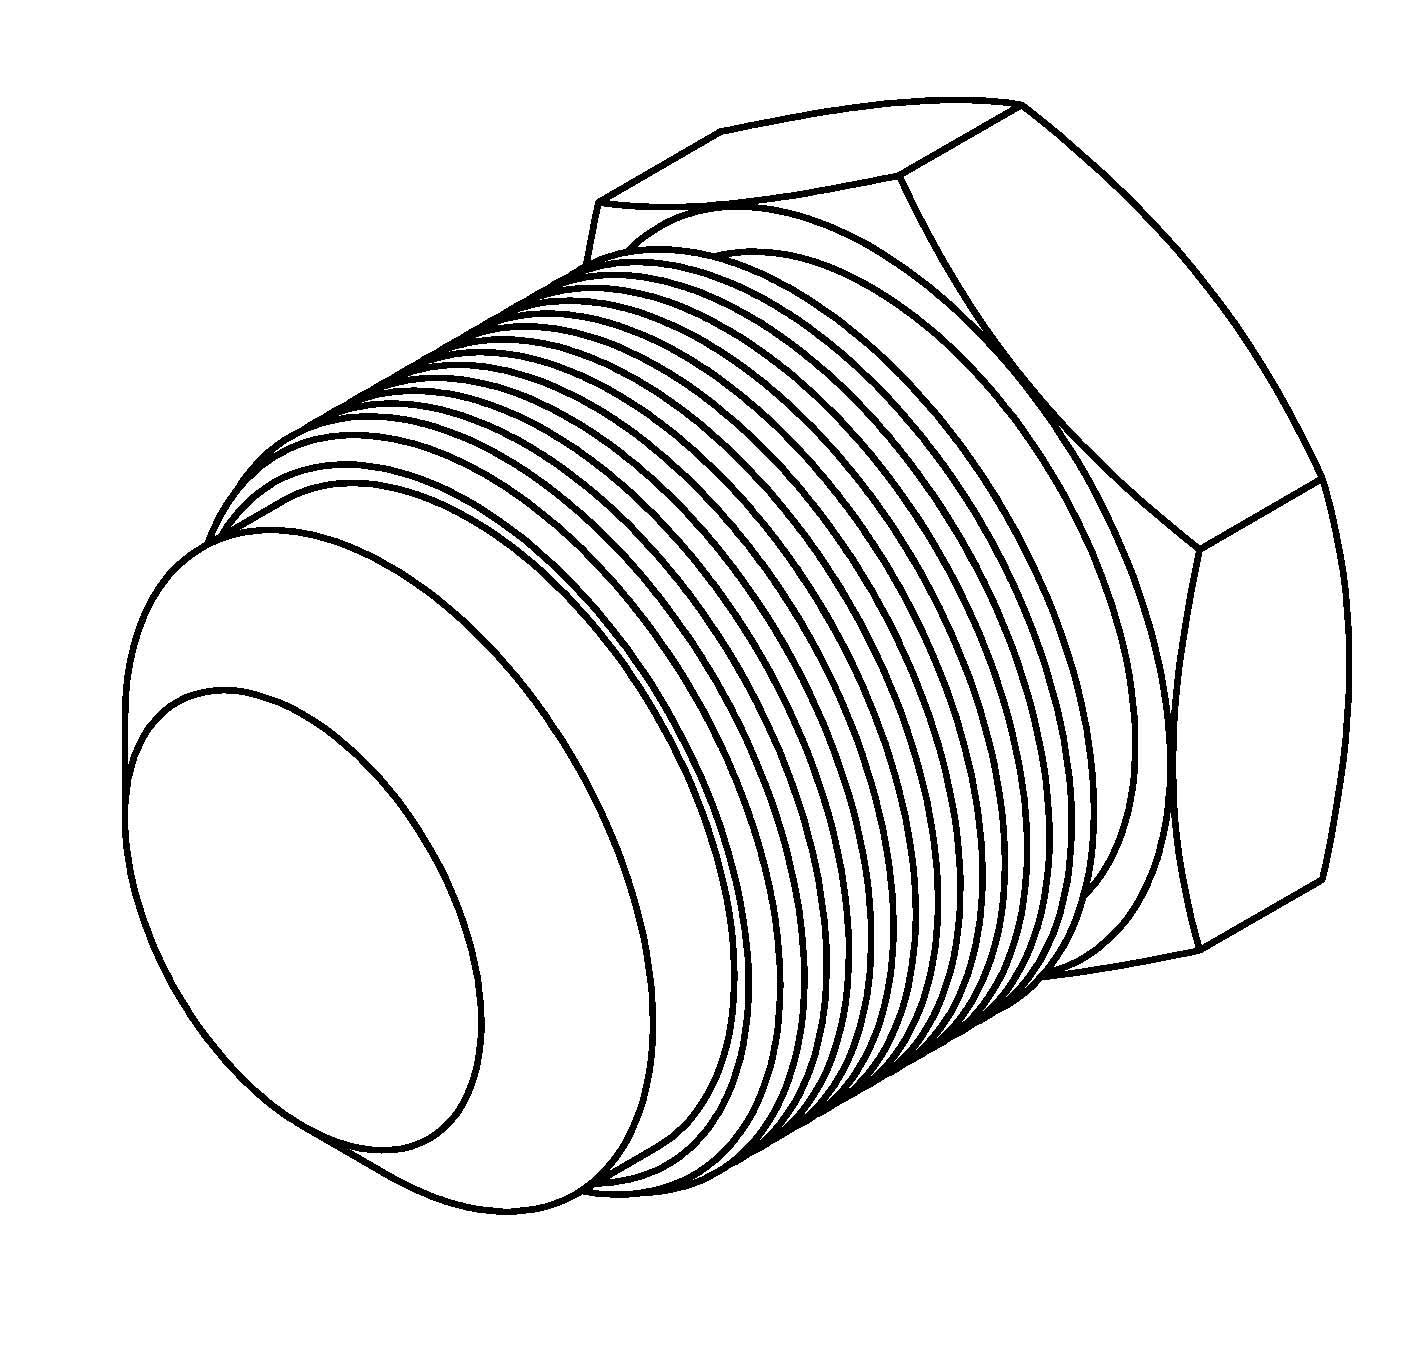 Brakequip Bq174 Weld On Fitting 1 1 16 X 14nf 3 4 Tube Alum